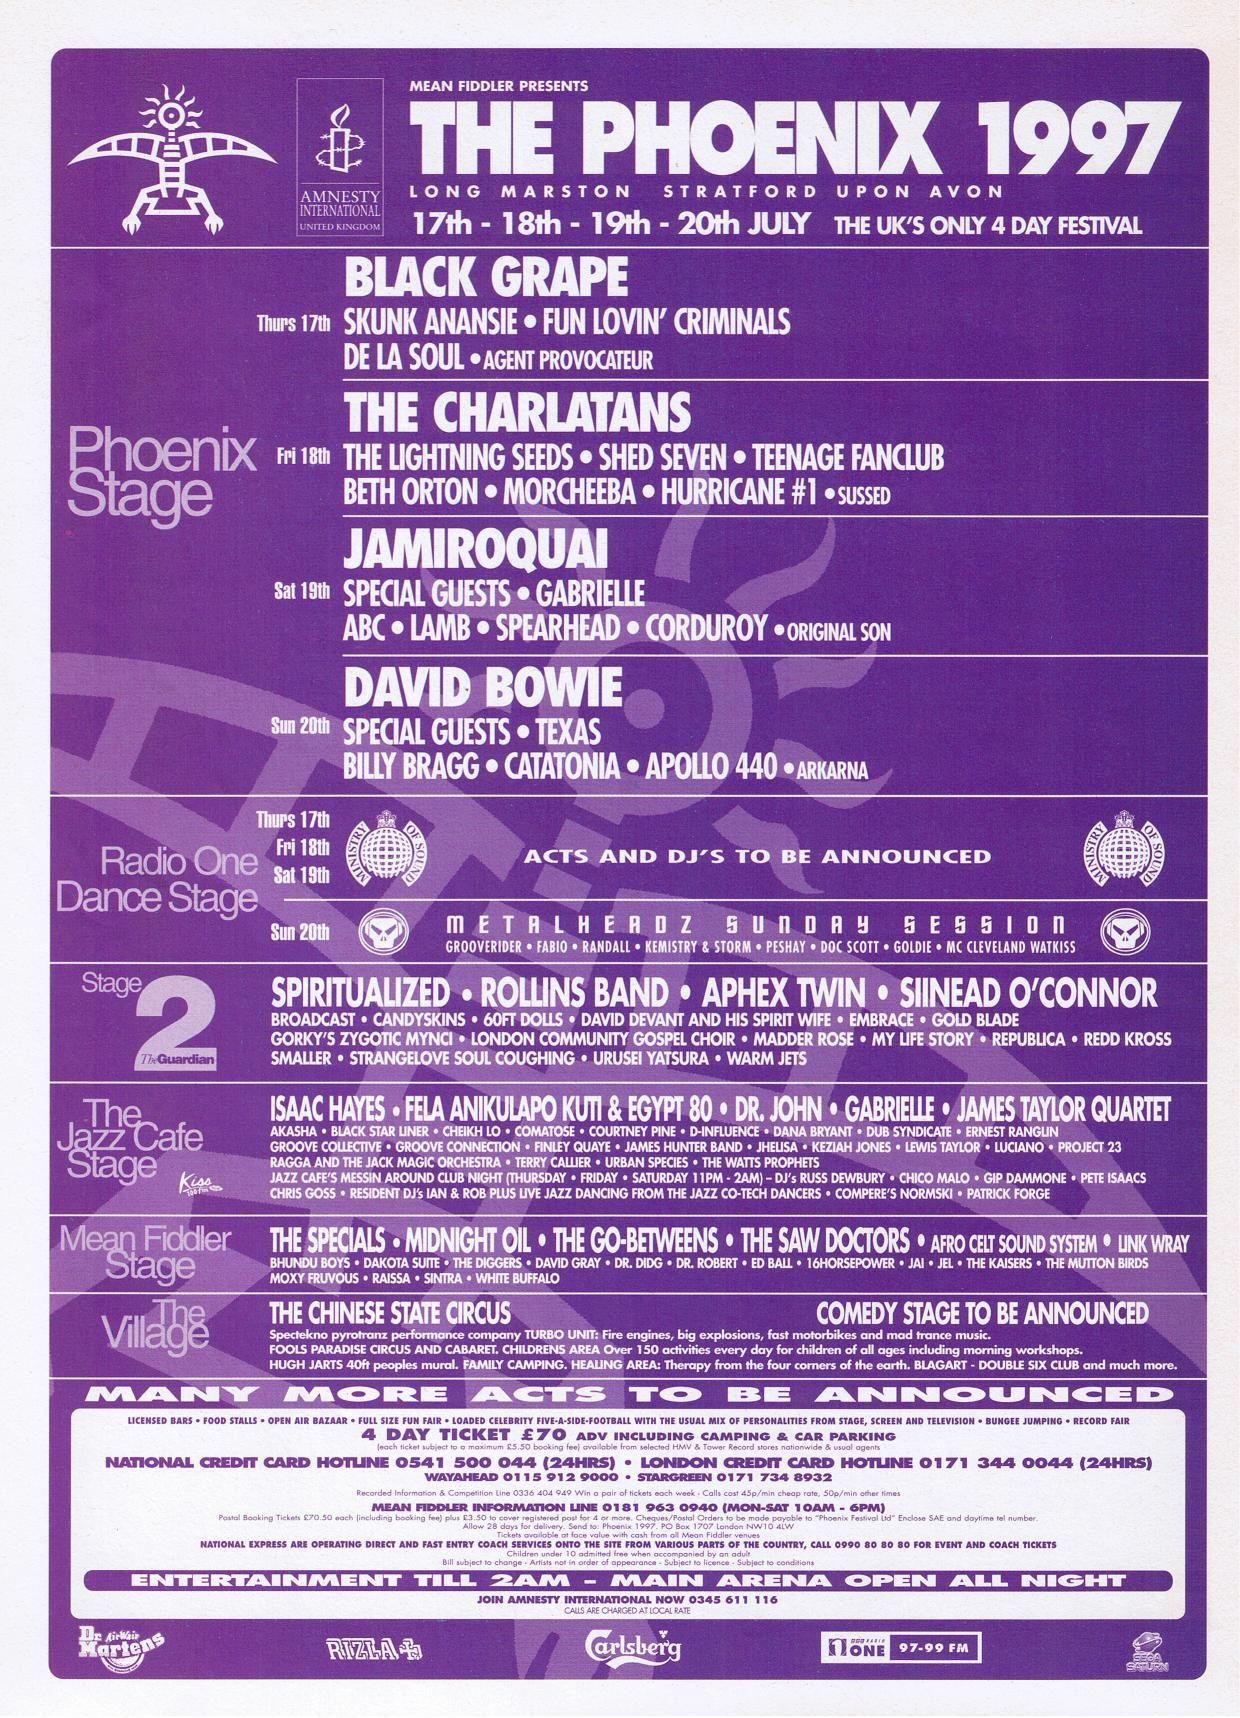 July 20th 1997 Phoenix Music Festival Stratford Upon Avon Britain